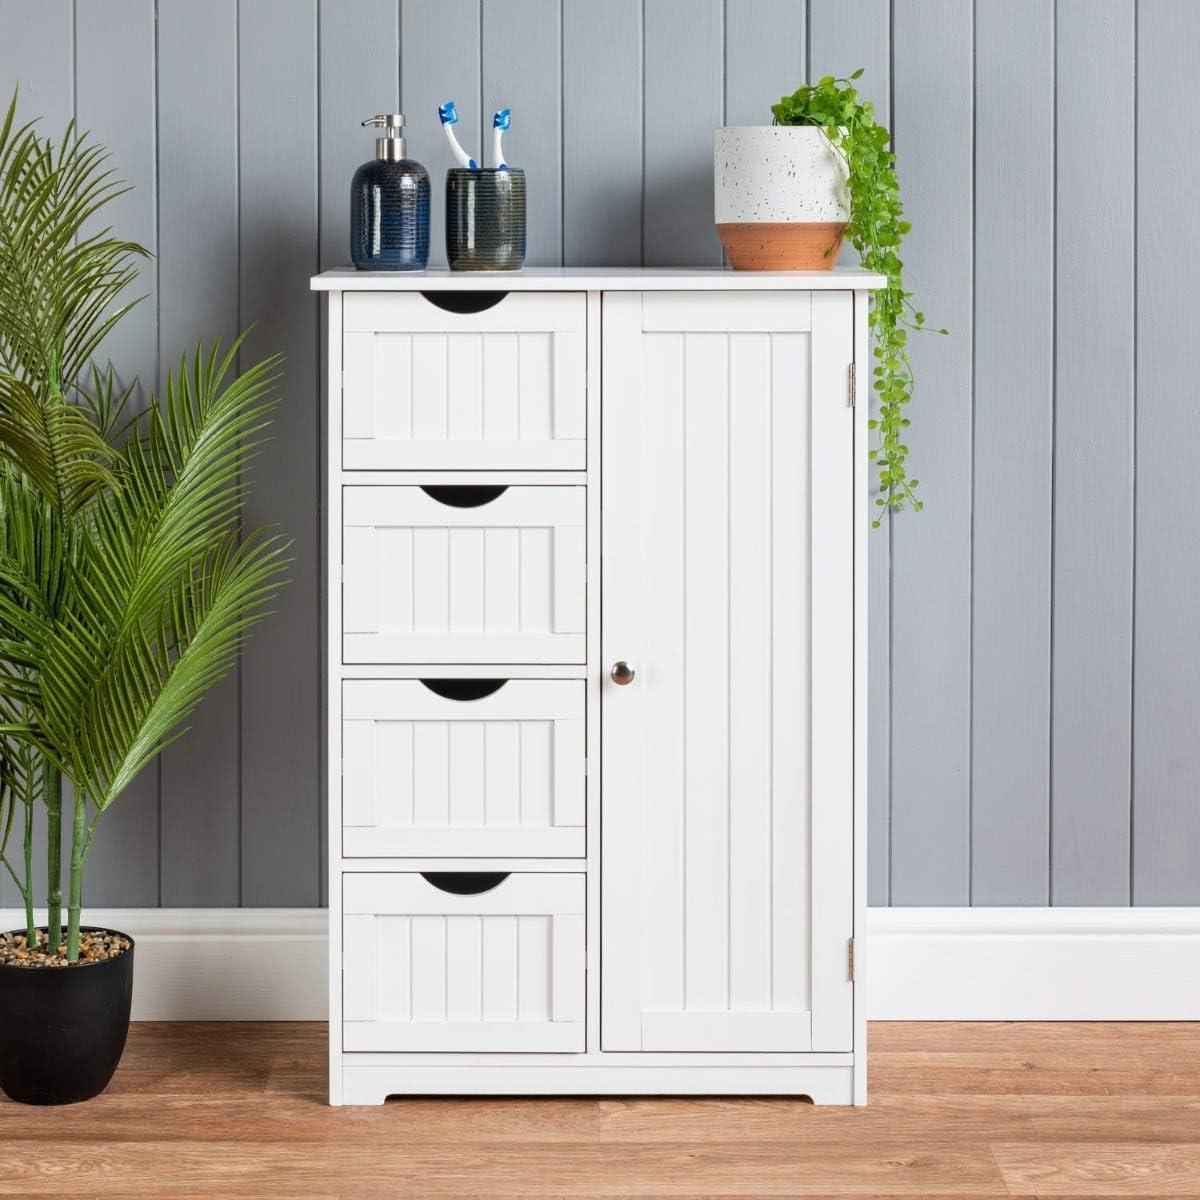 CHRISTOW Bathroom Cabinet Floor Standing, Wooden White 4 Drawer Storage Cupboard Unit With Shelf